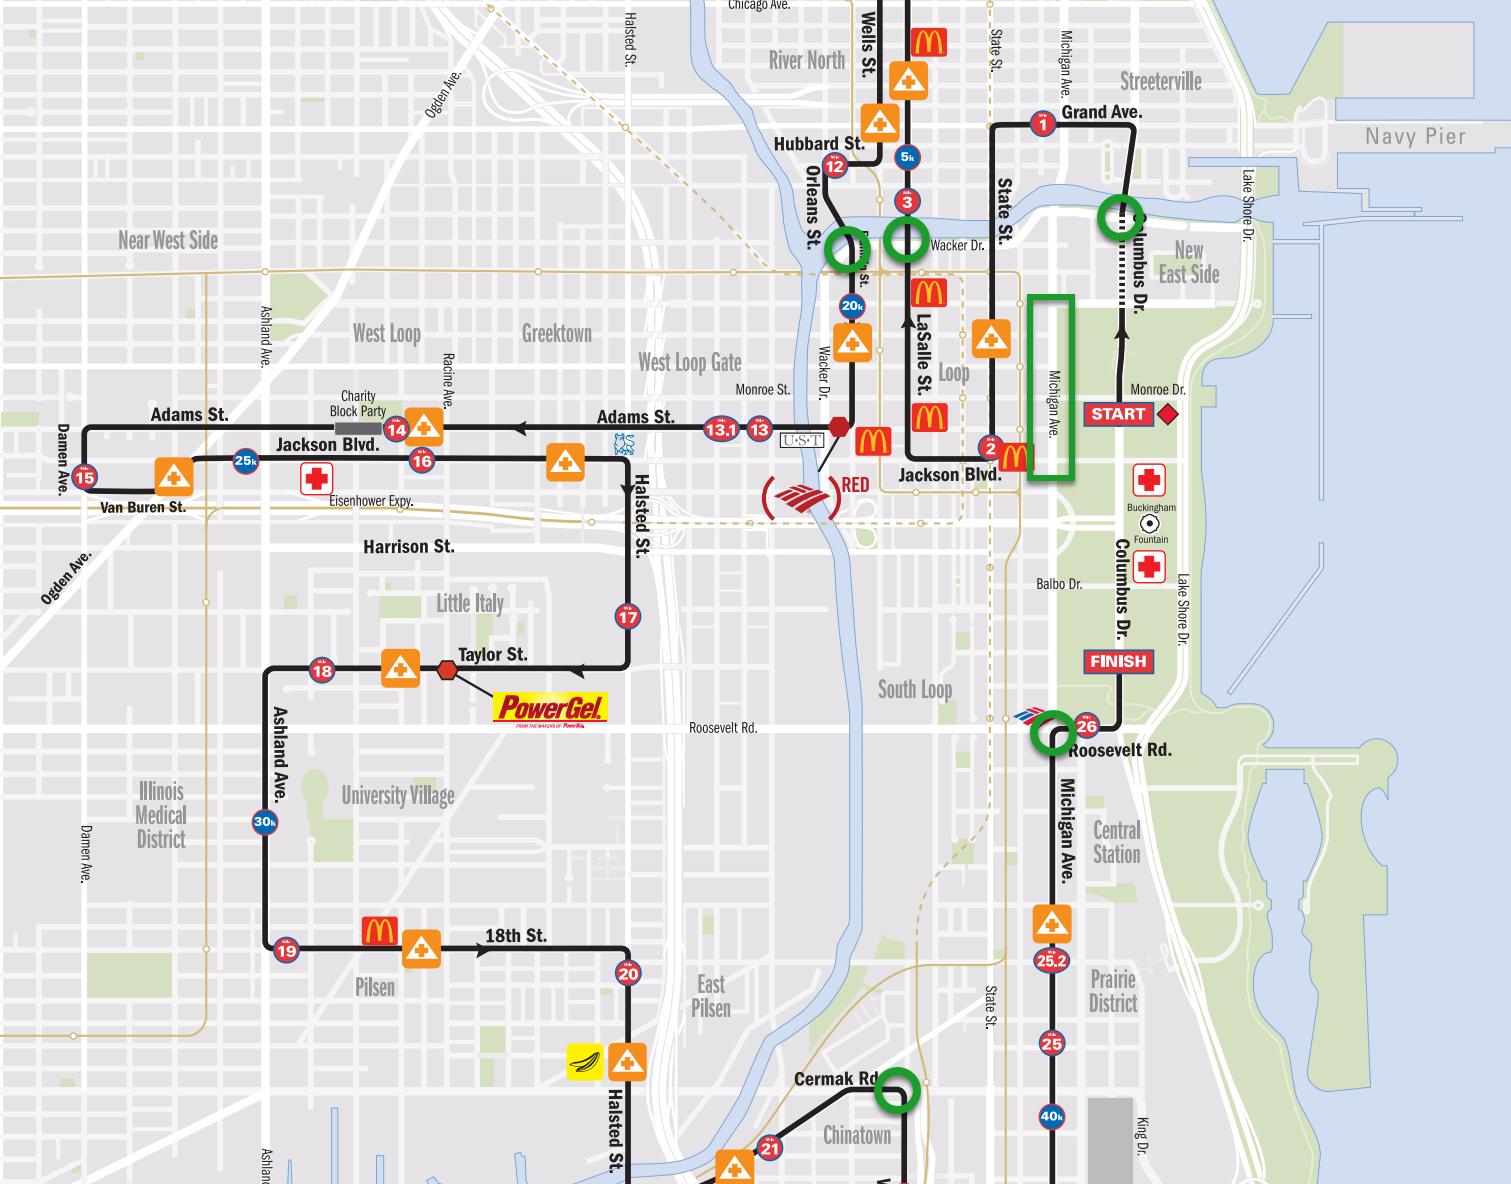 Perfect Pace - Chicago Marathon - Spectator Location.png